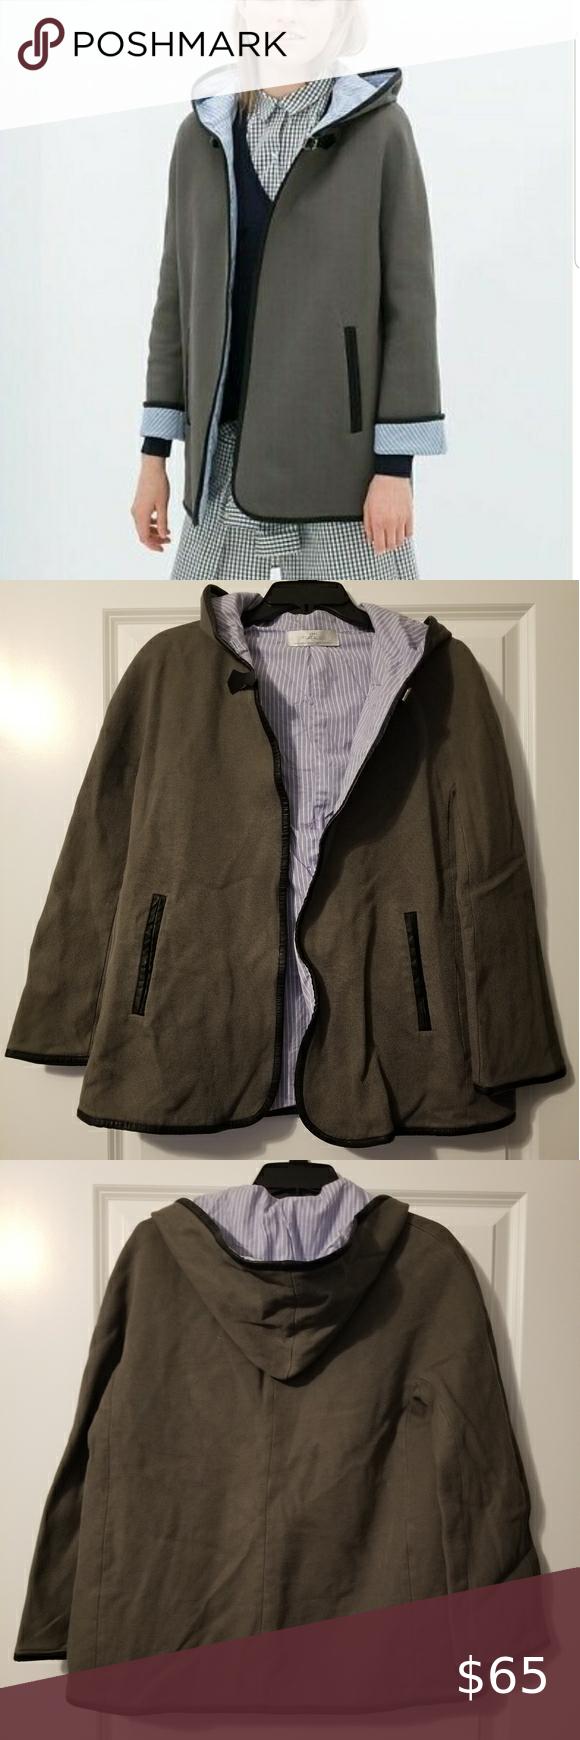 Zara Trafaluc Jacket Zara Trafaluc Hooded Jacket In A Size Medium Cape Style With A Buckle At The Mustard Leather Jacket Zara Faux Fur Coat Coats Jackets Women [ 1740 x 580 Pixel ]